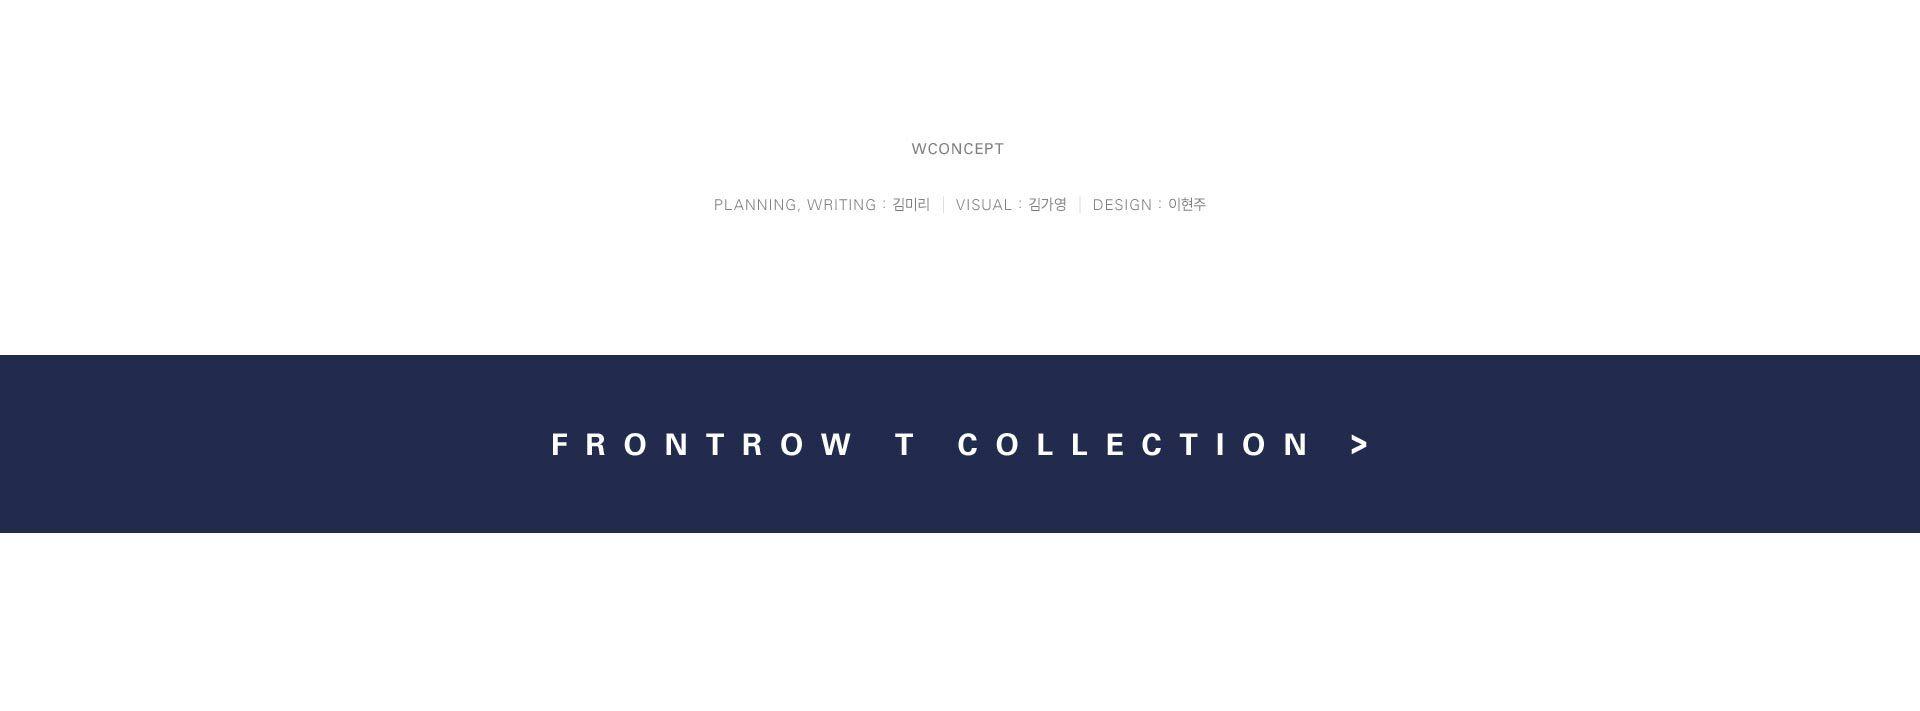 Wconcept Planning, Writing : 김미리 | Visual : 김가영 | Design : 이현주